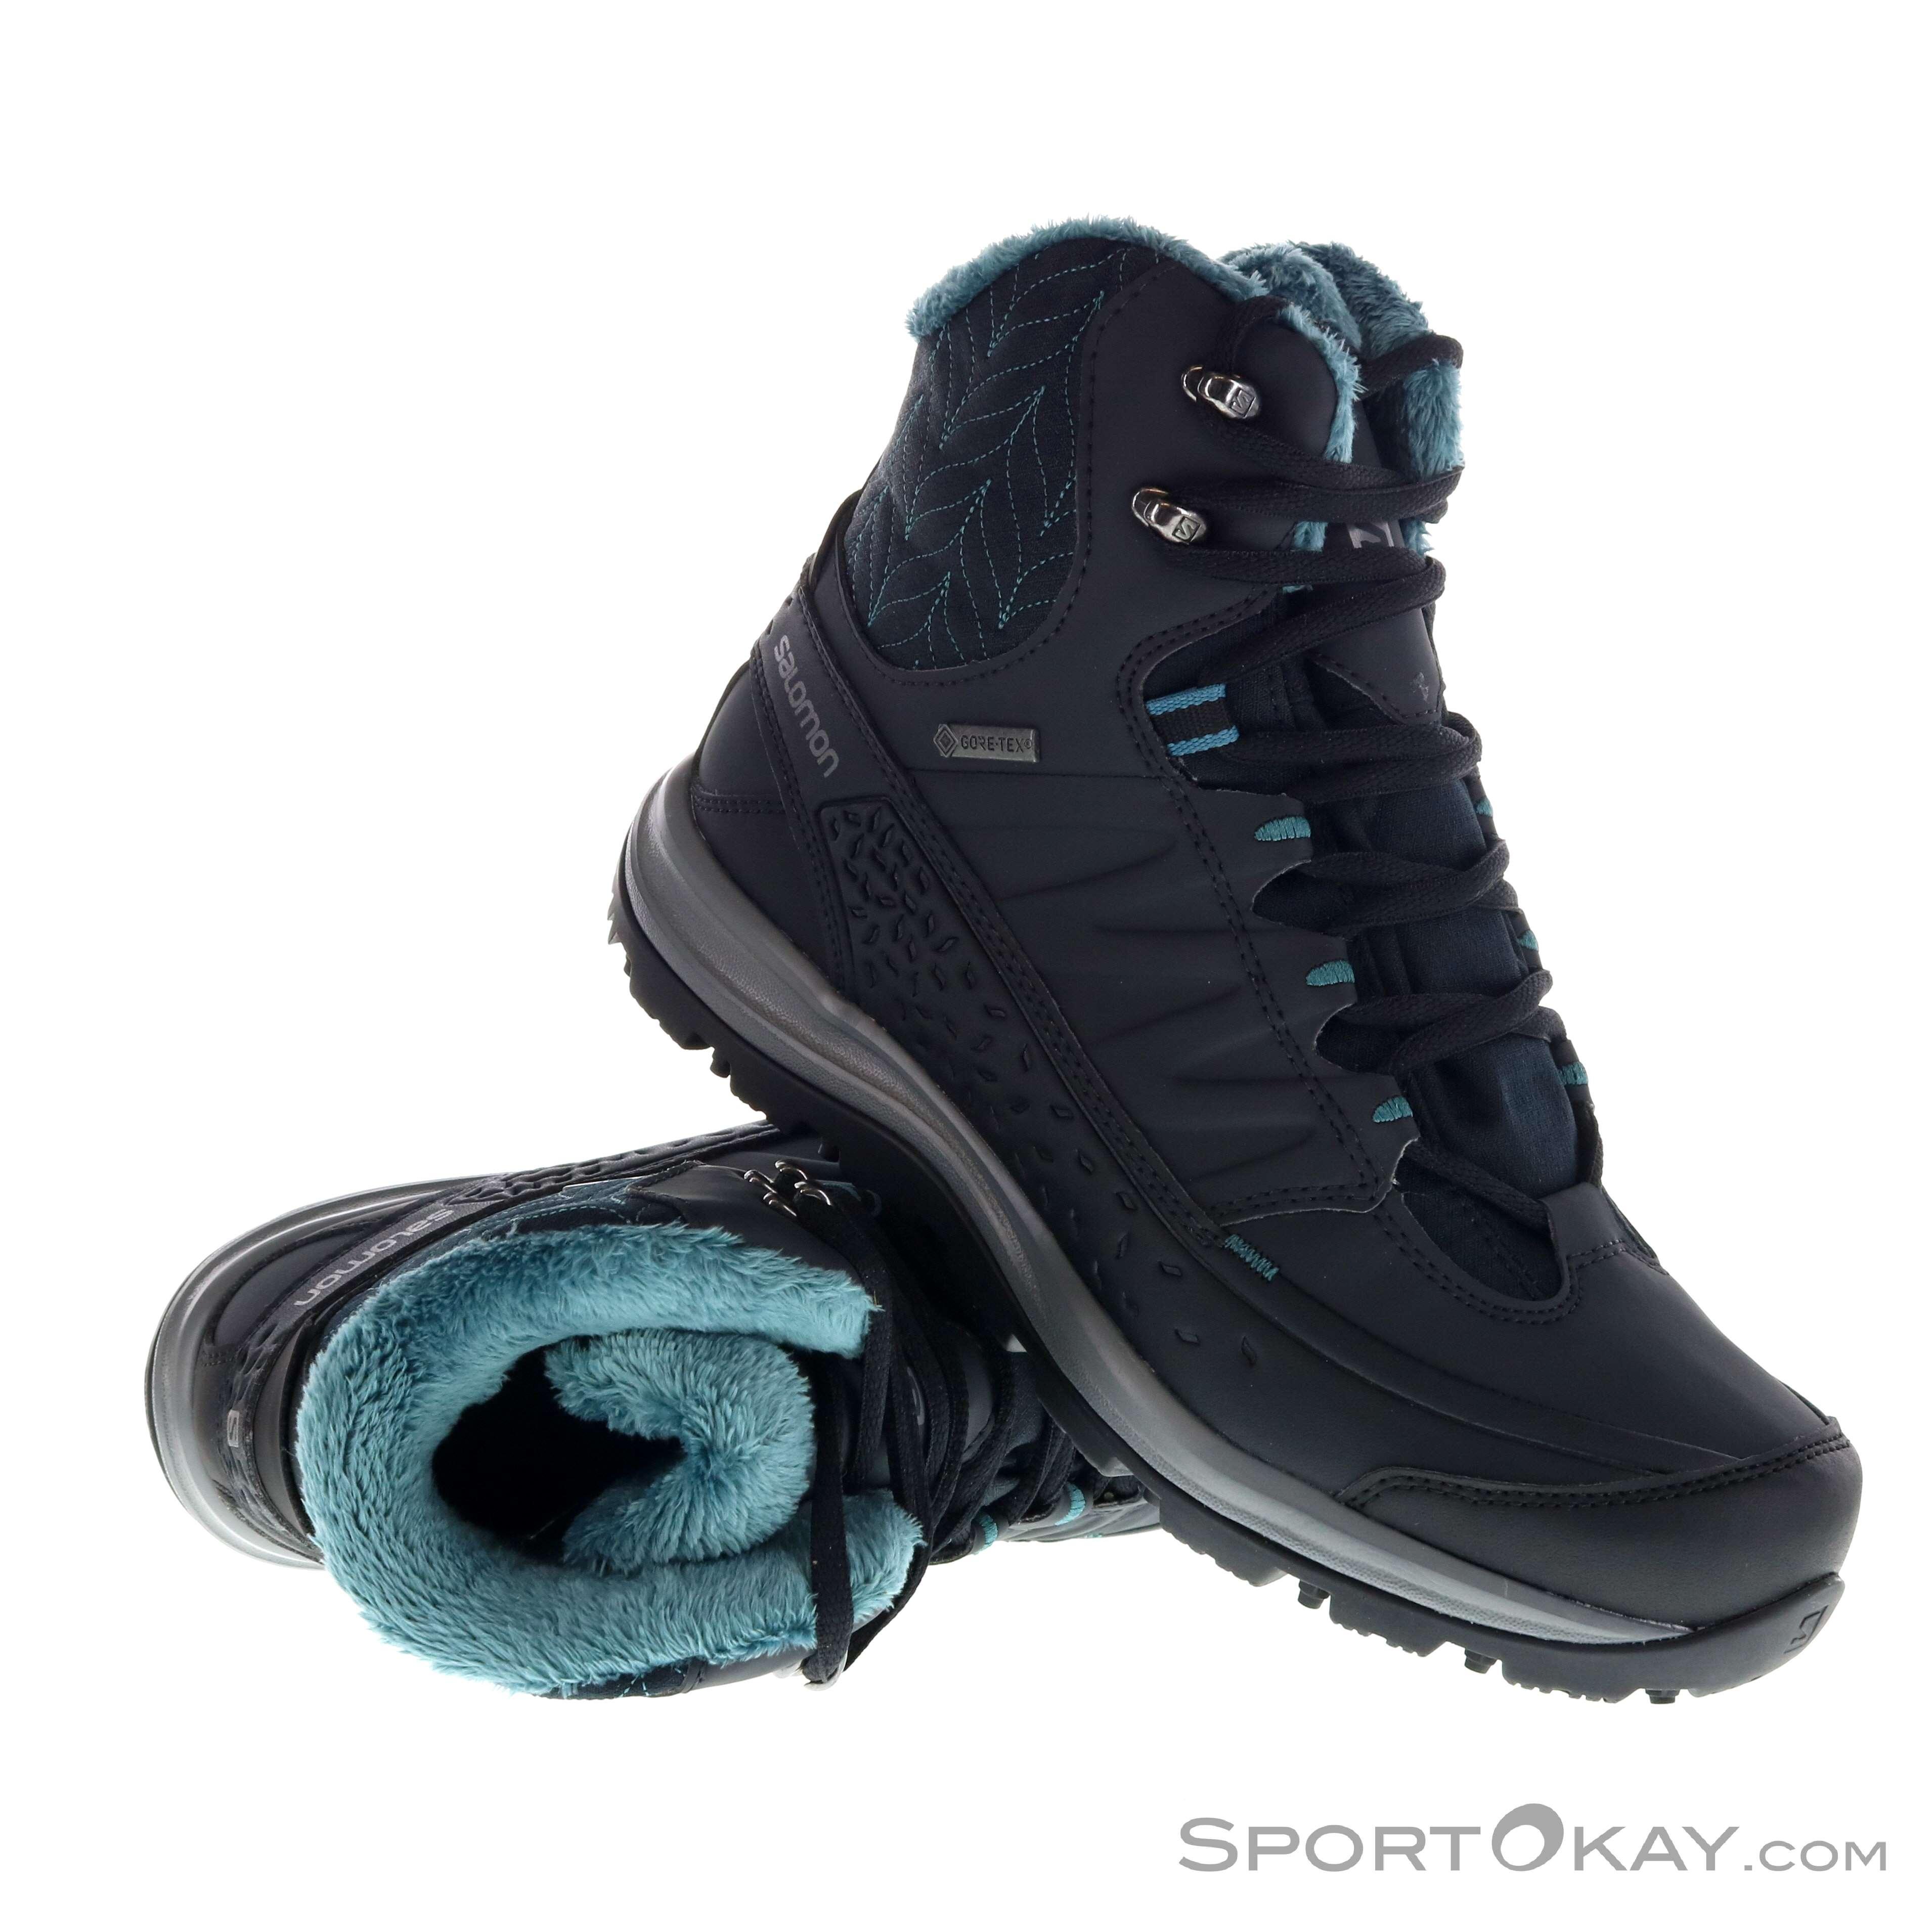 98e5f292123 Salomon Salomon Kaina Mid GTX Womens Winter Shoes Gore-Tex